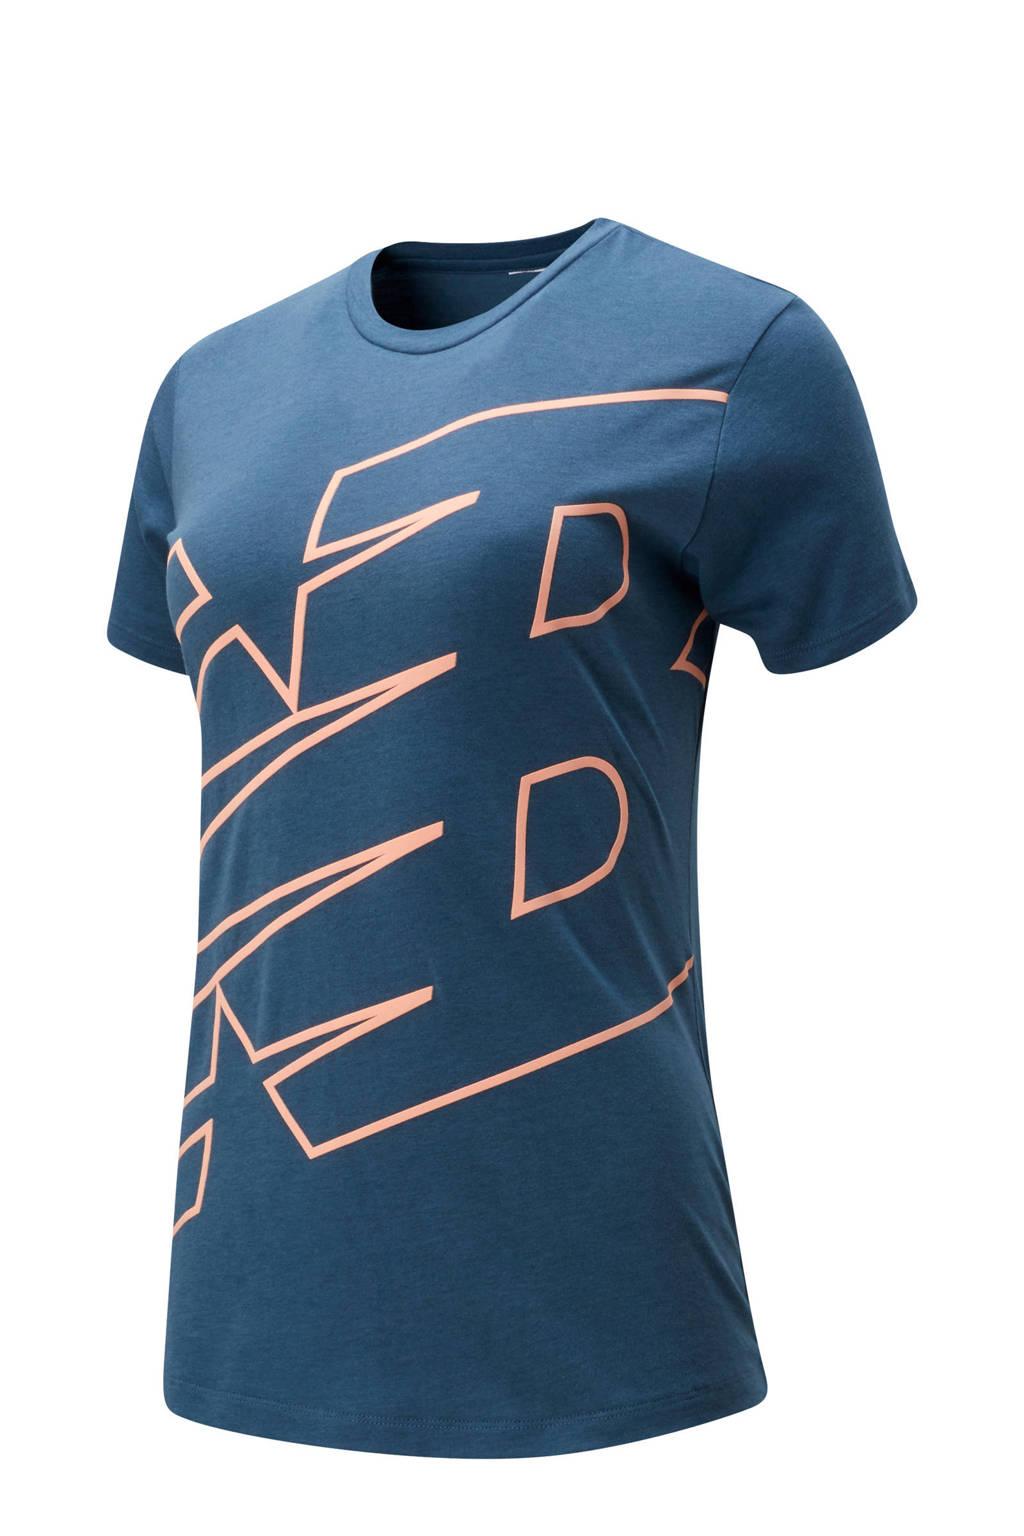 New Balance sport T-shirt blauw, Blauw